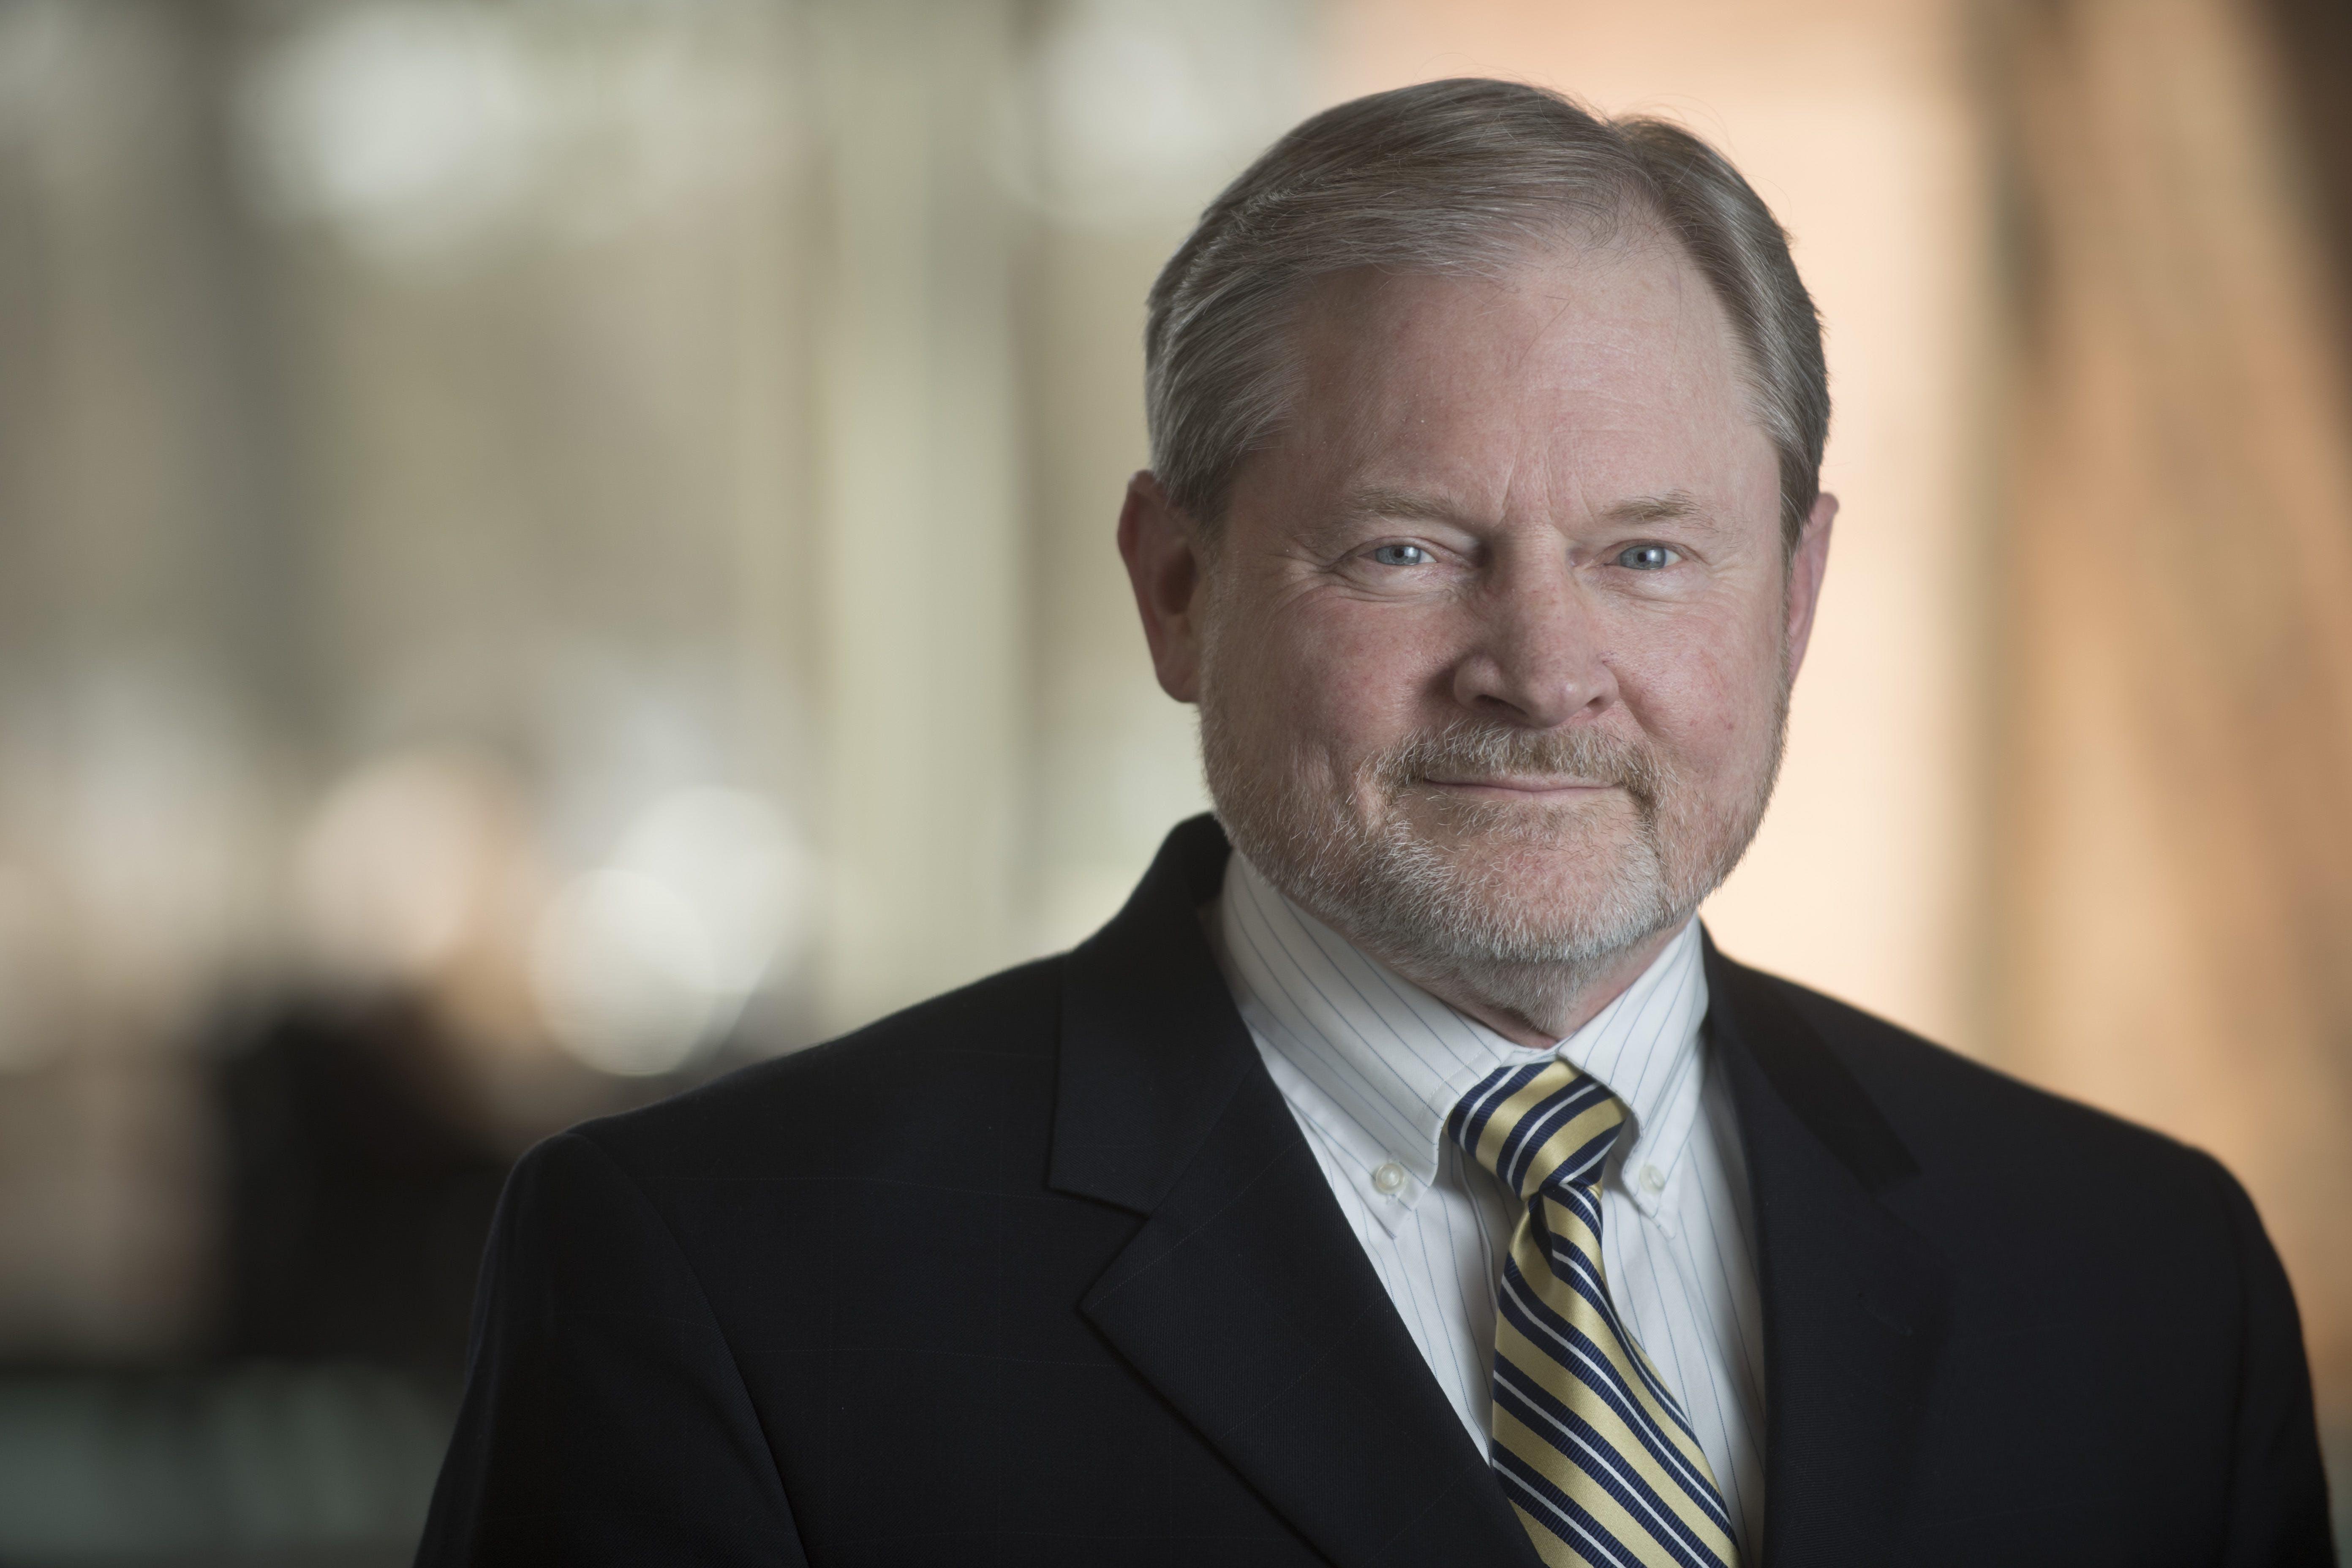 Bethel University President Jay Barnes Announces Retirement